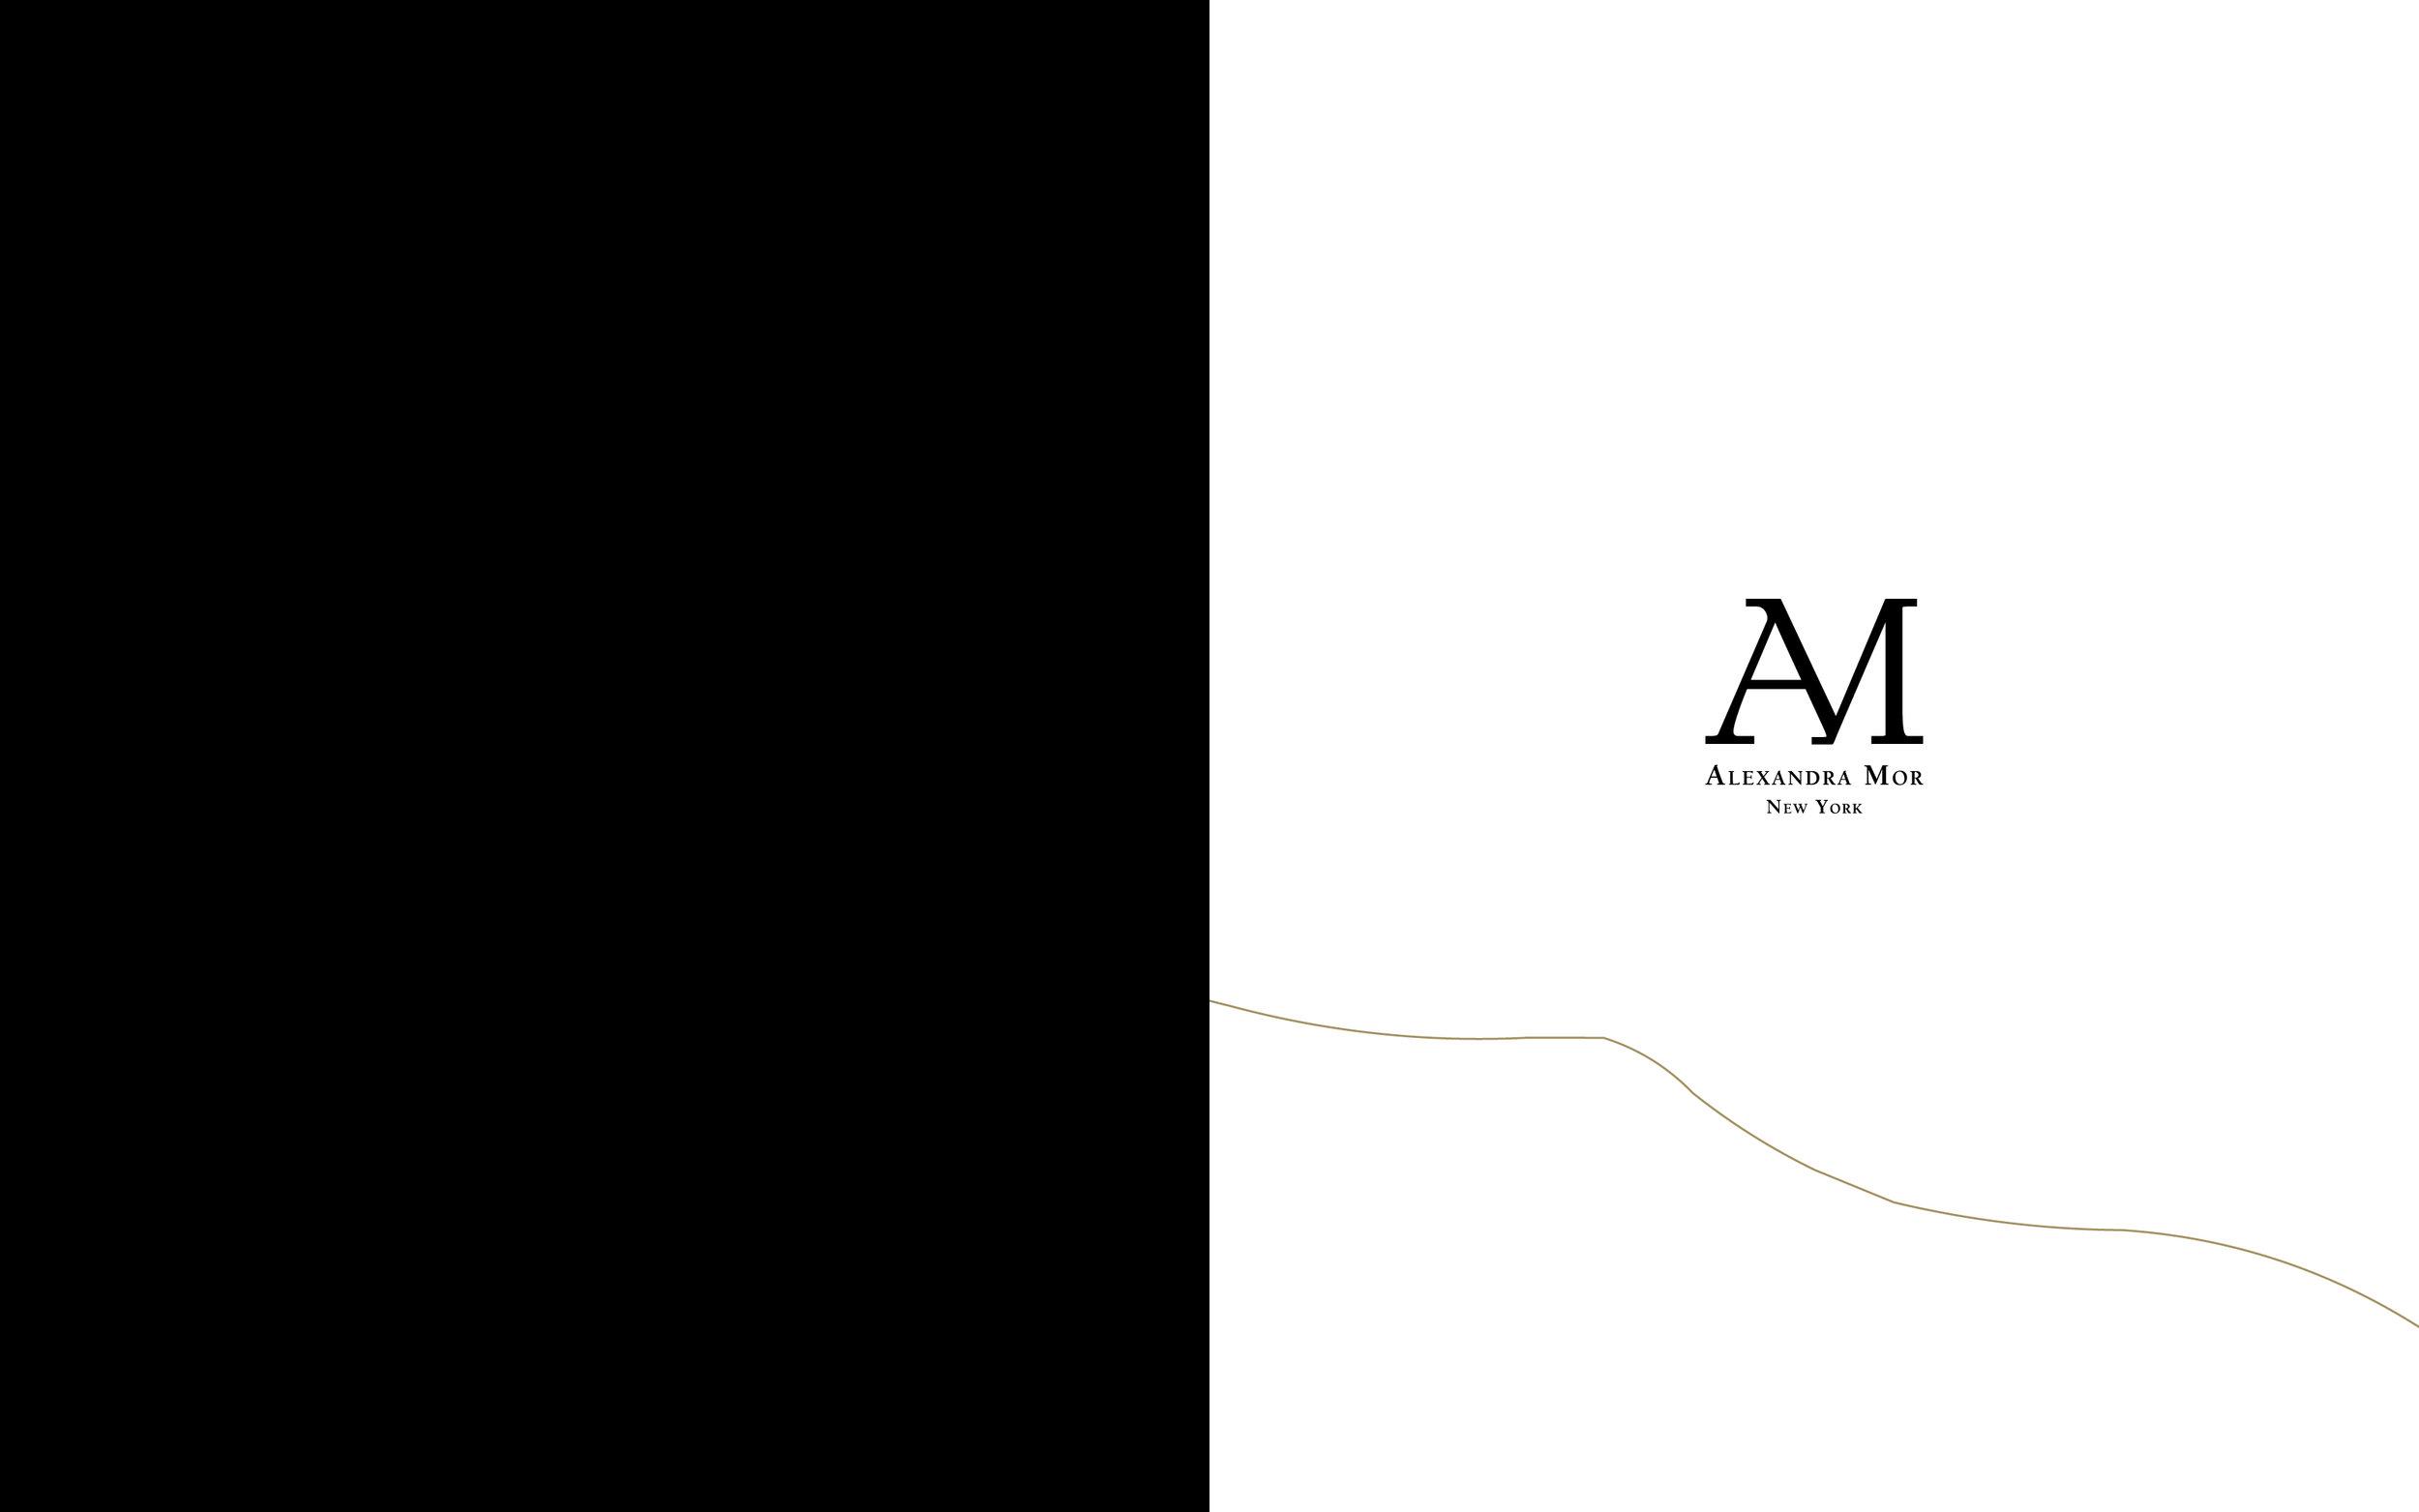 AM_COLLECTORS_GUIDE NO. 5 03.12.18.jpg